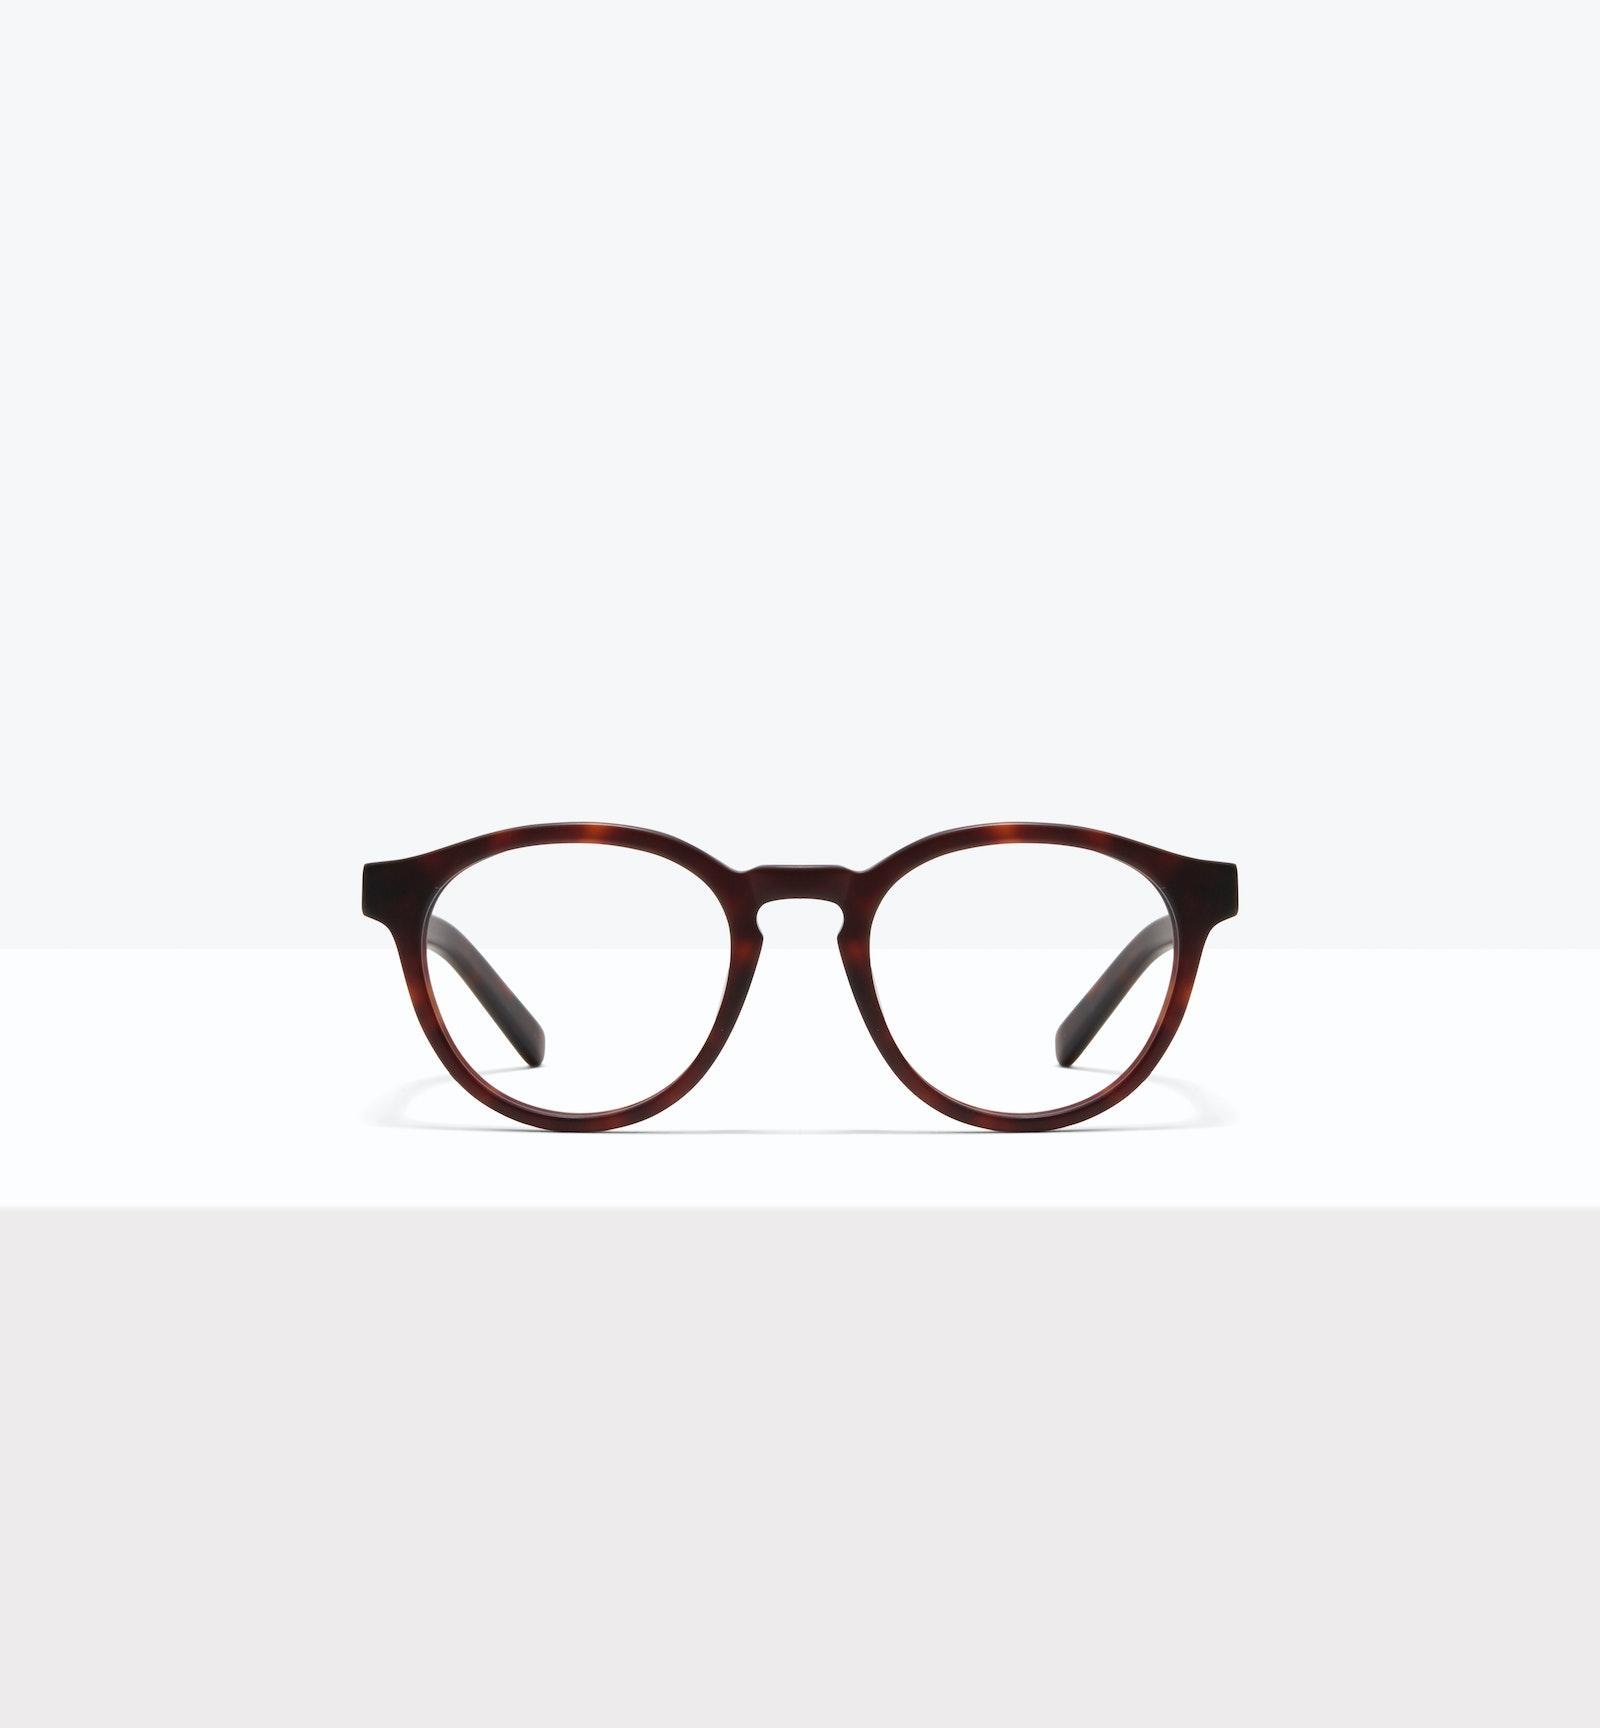 Affordable Fashion Glasses Round Eyeglasses Men Gent S Matte Tortoise